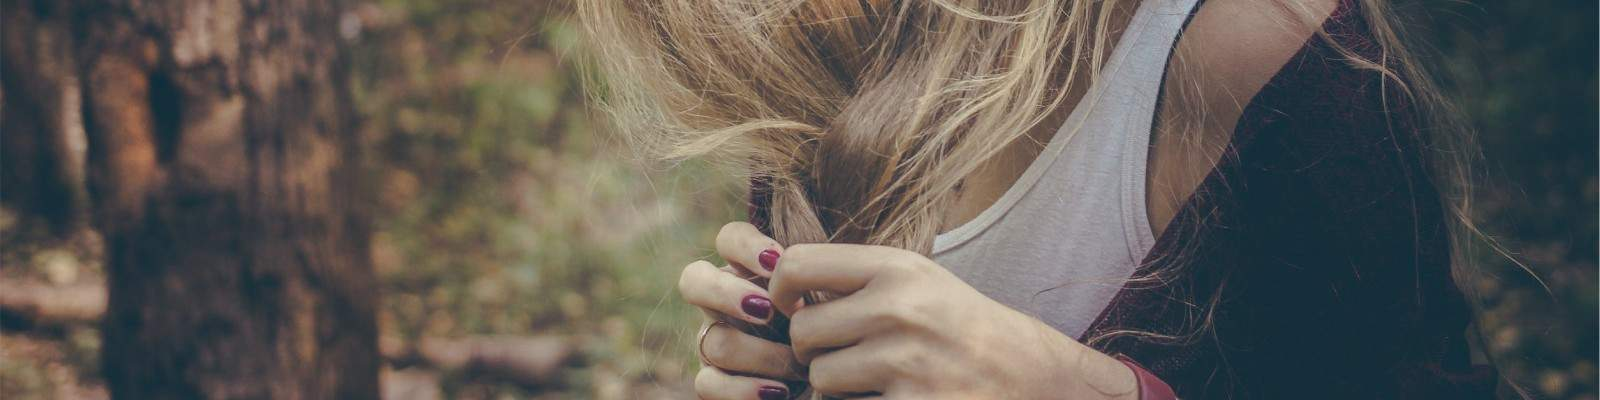 Trichotillomanie, dwangmatig haren trekken